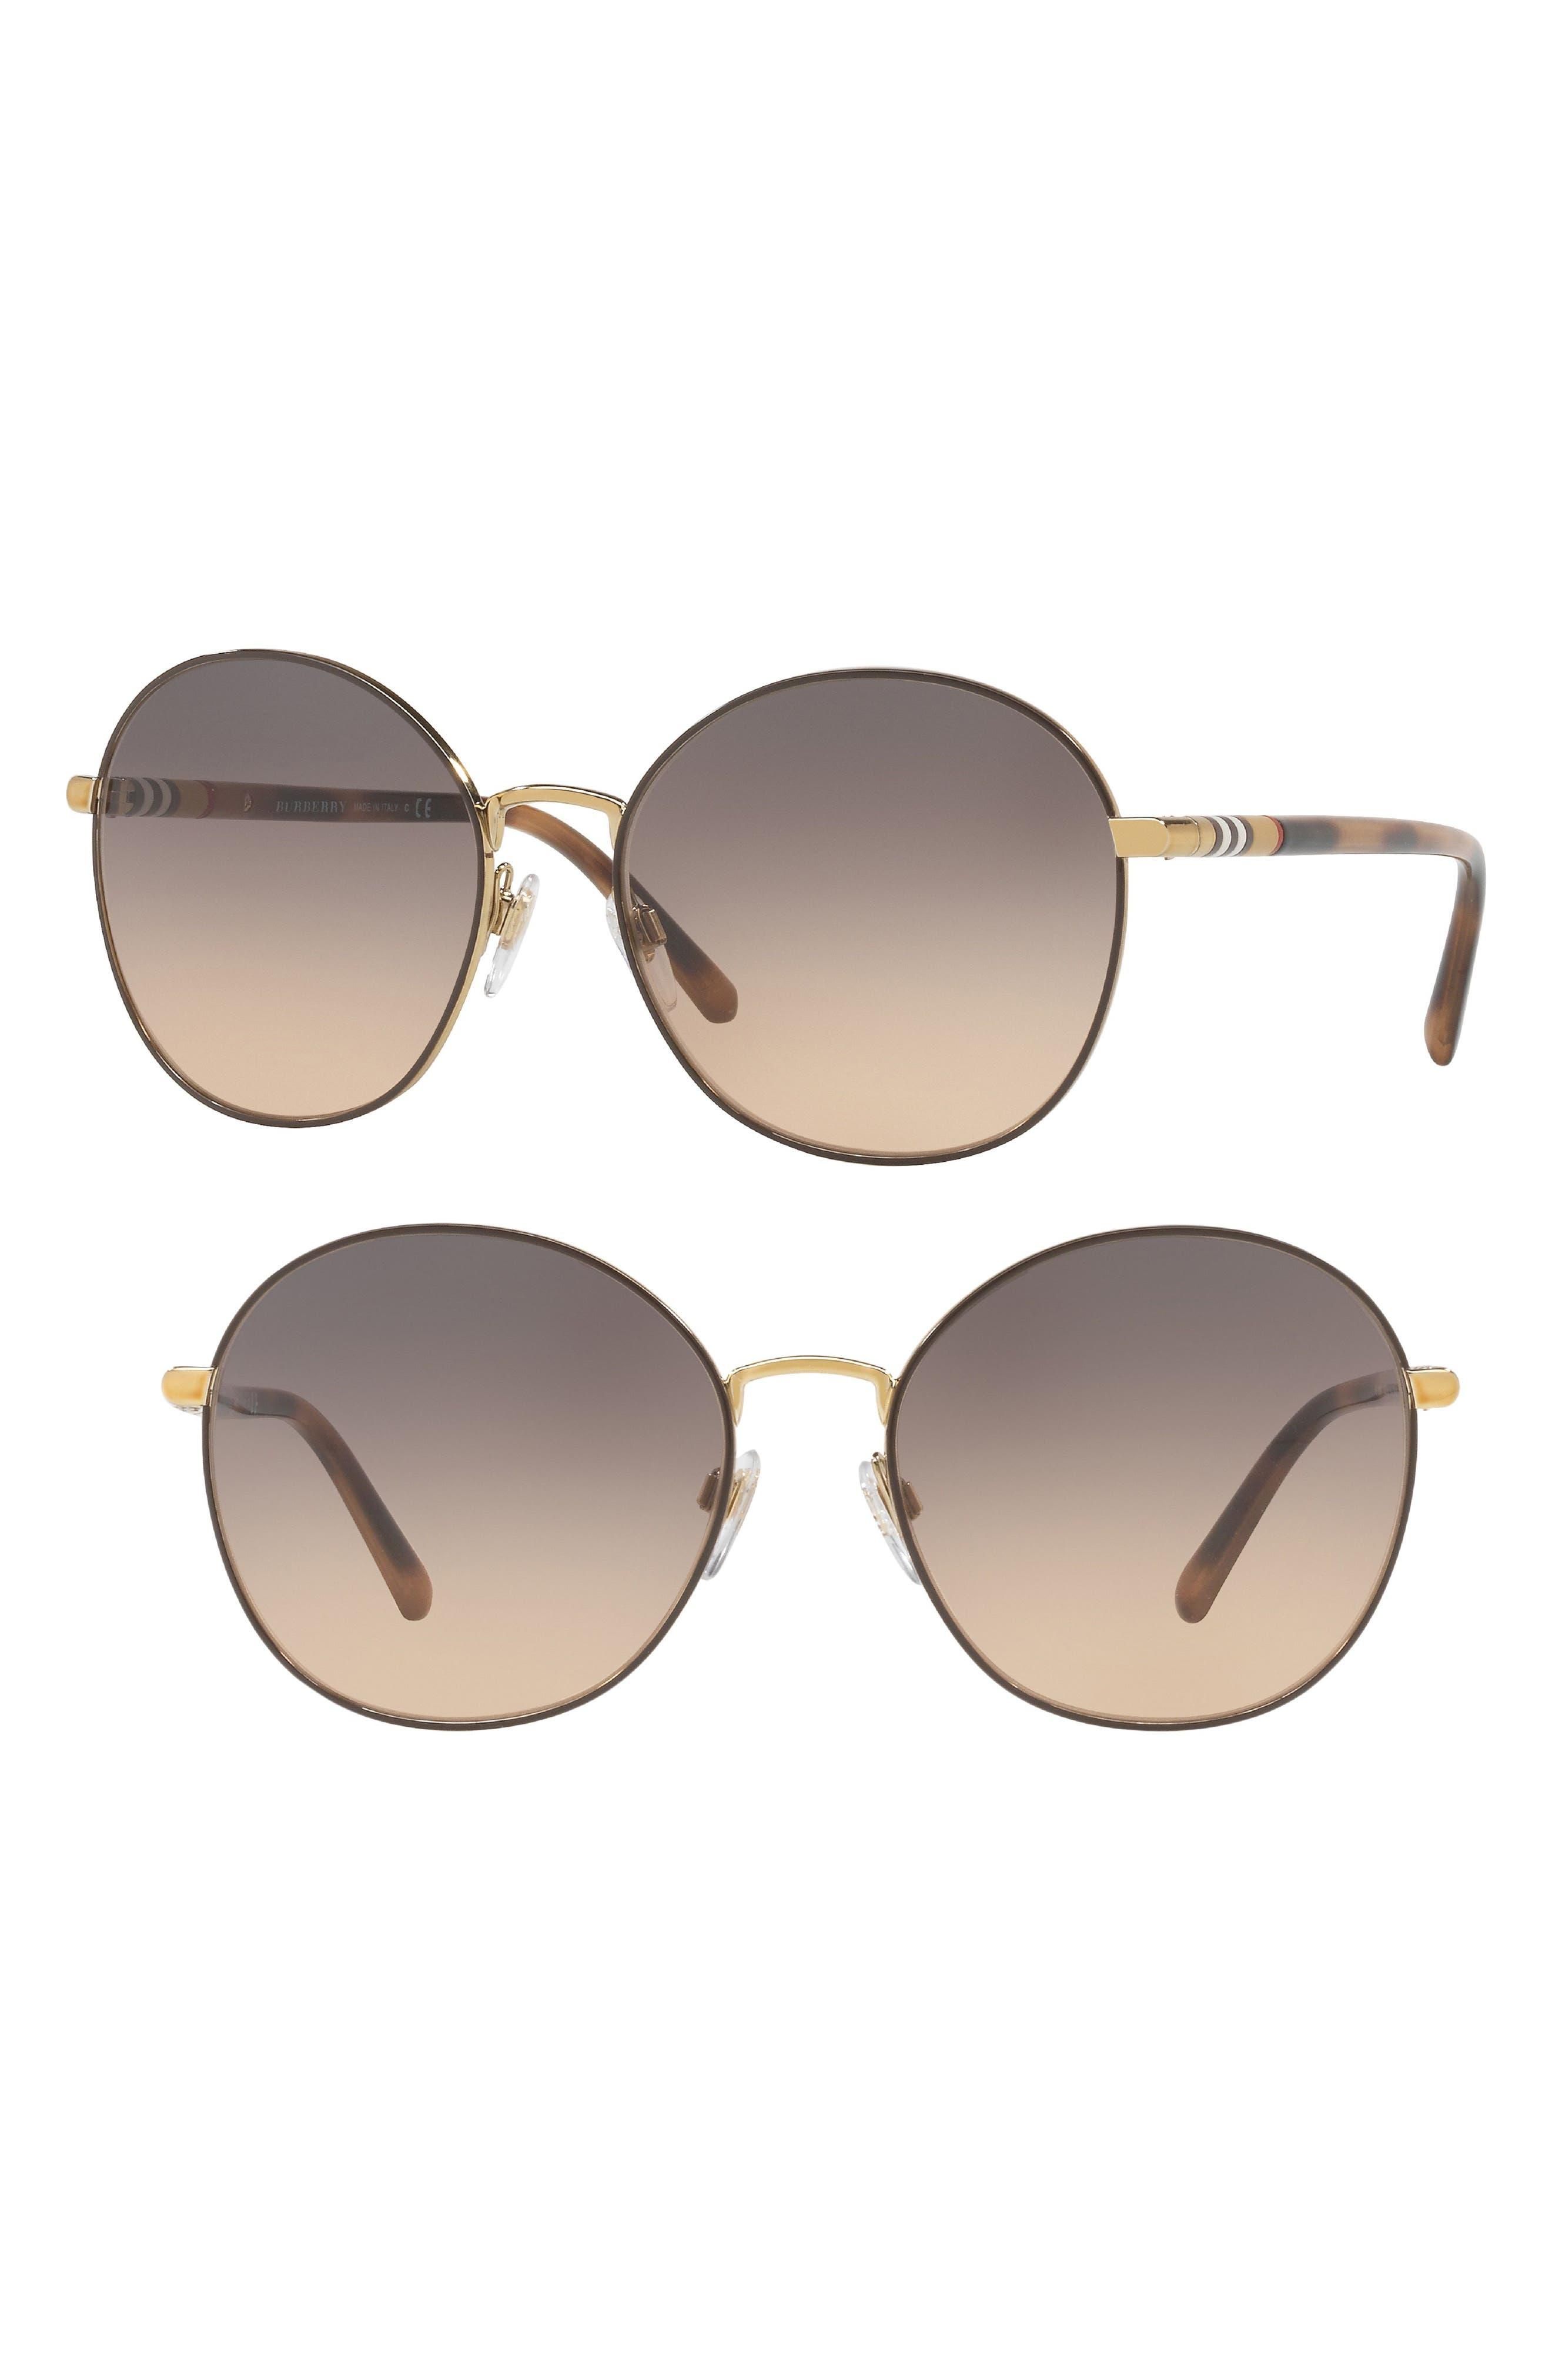 56mm Gradient Round Sunglasses,                             Main thumbnail 1, color,                             PALE GOLD